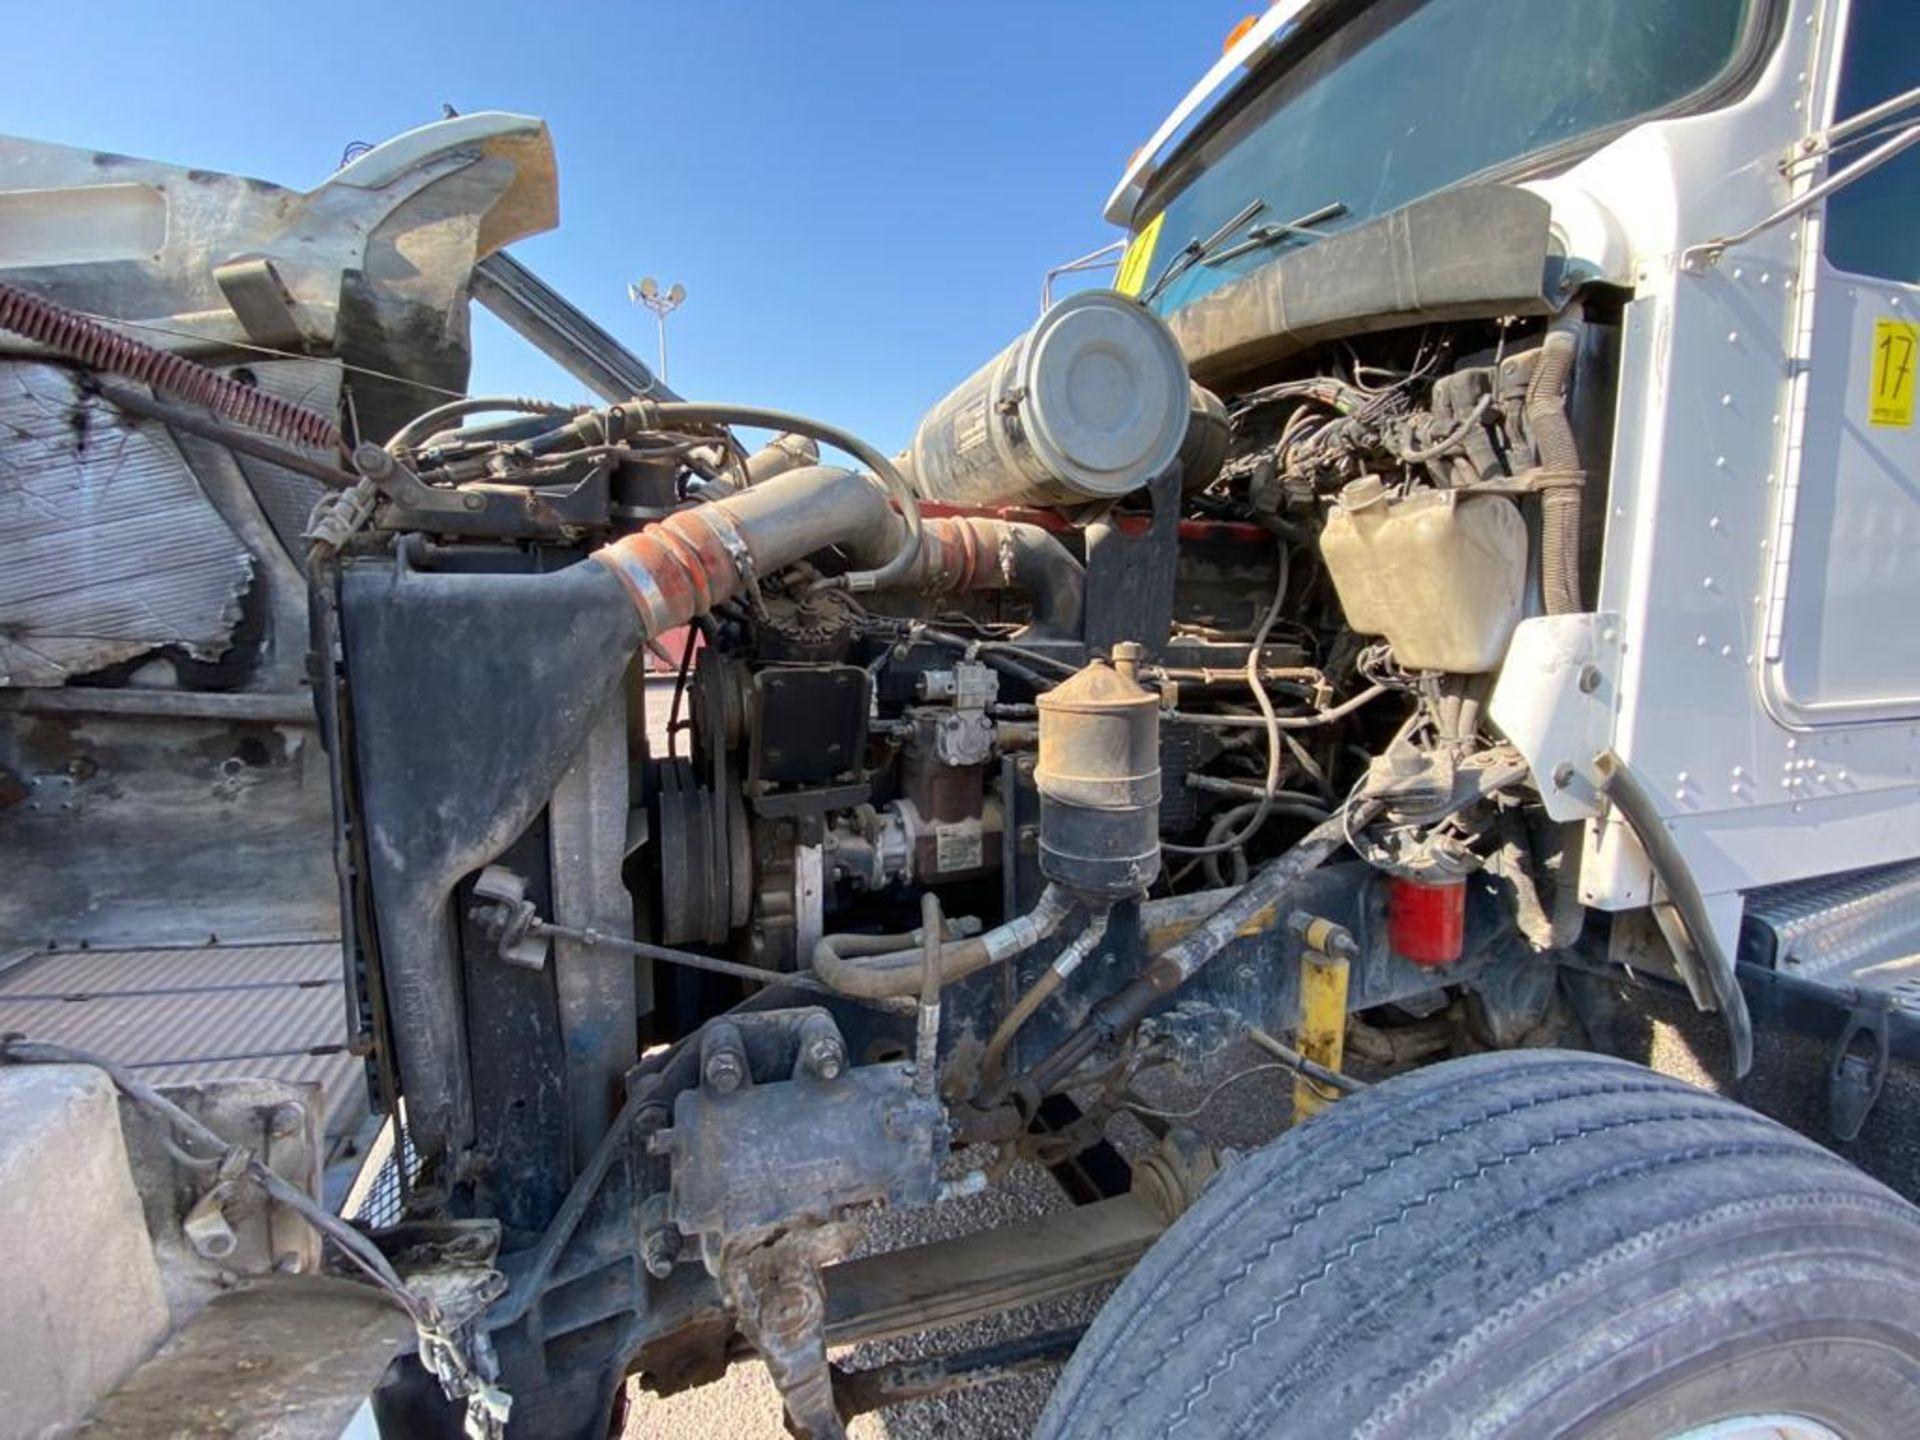 1998 Kenworth Sleeper Truck Tractor, standard transmission of 18 speeds - Image 47 of 55